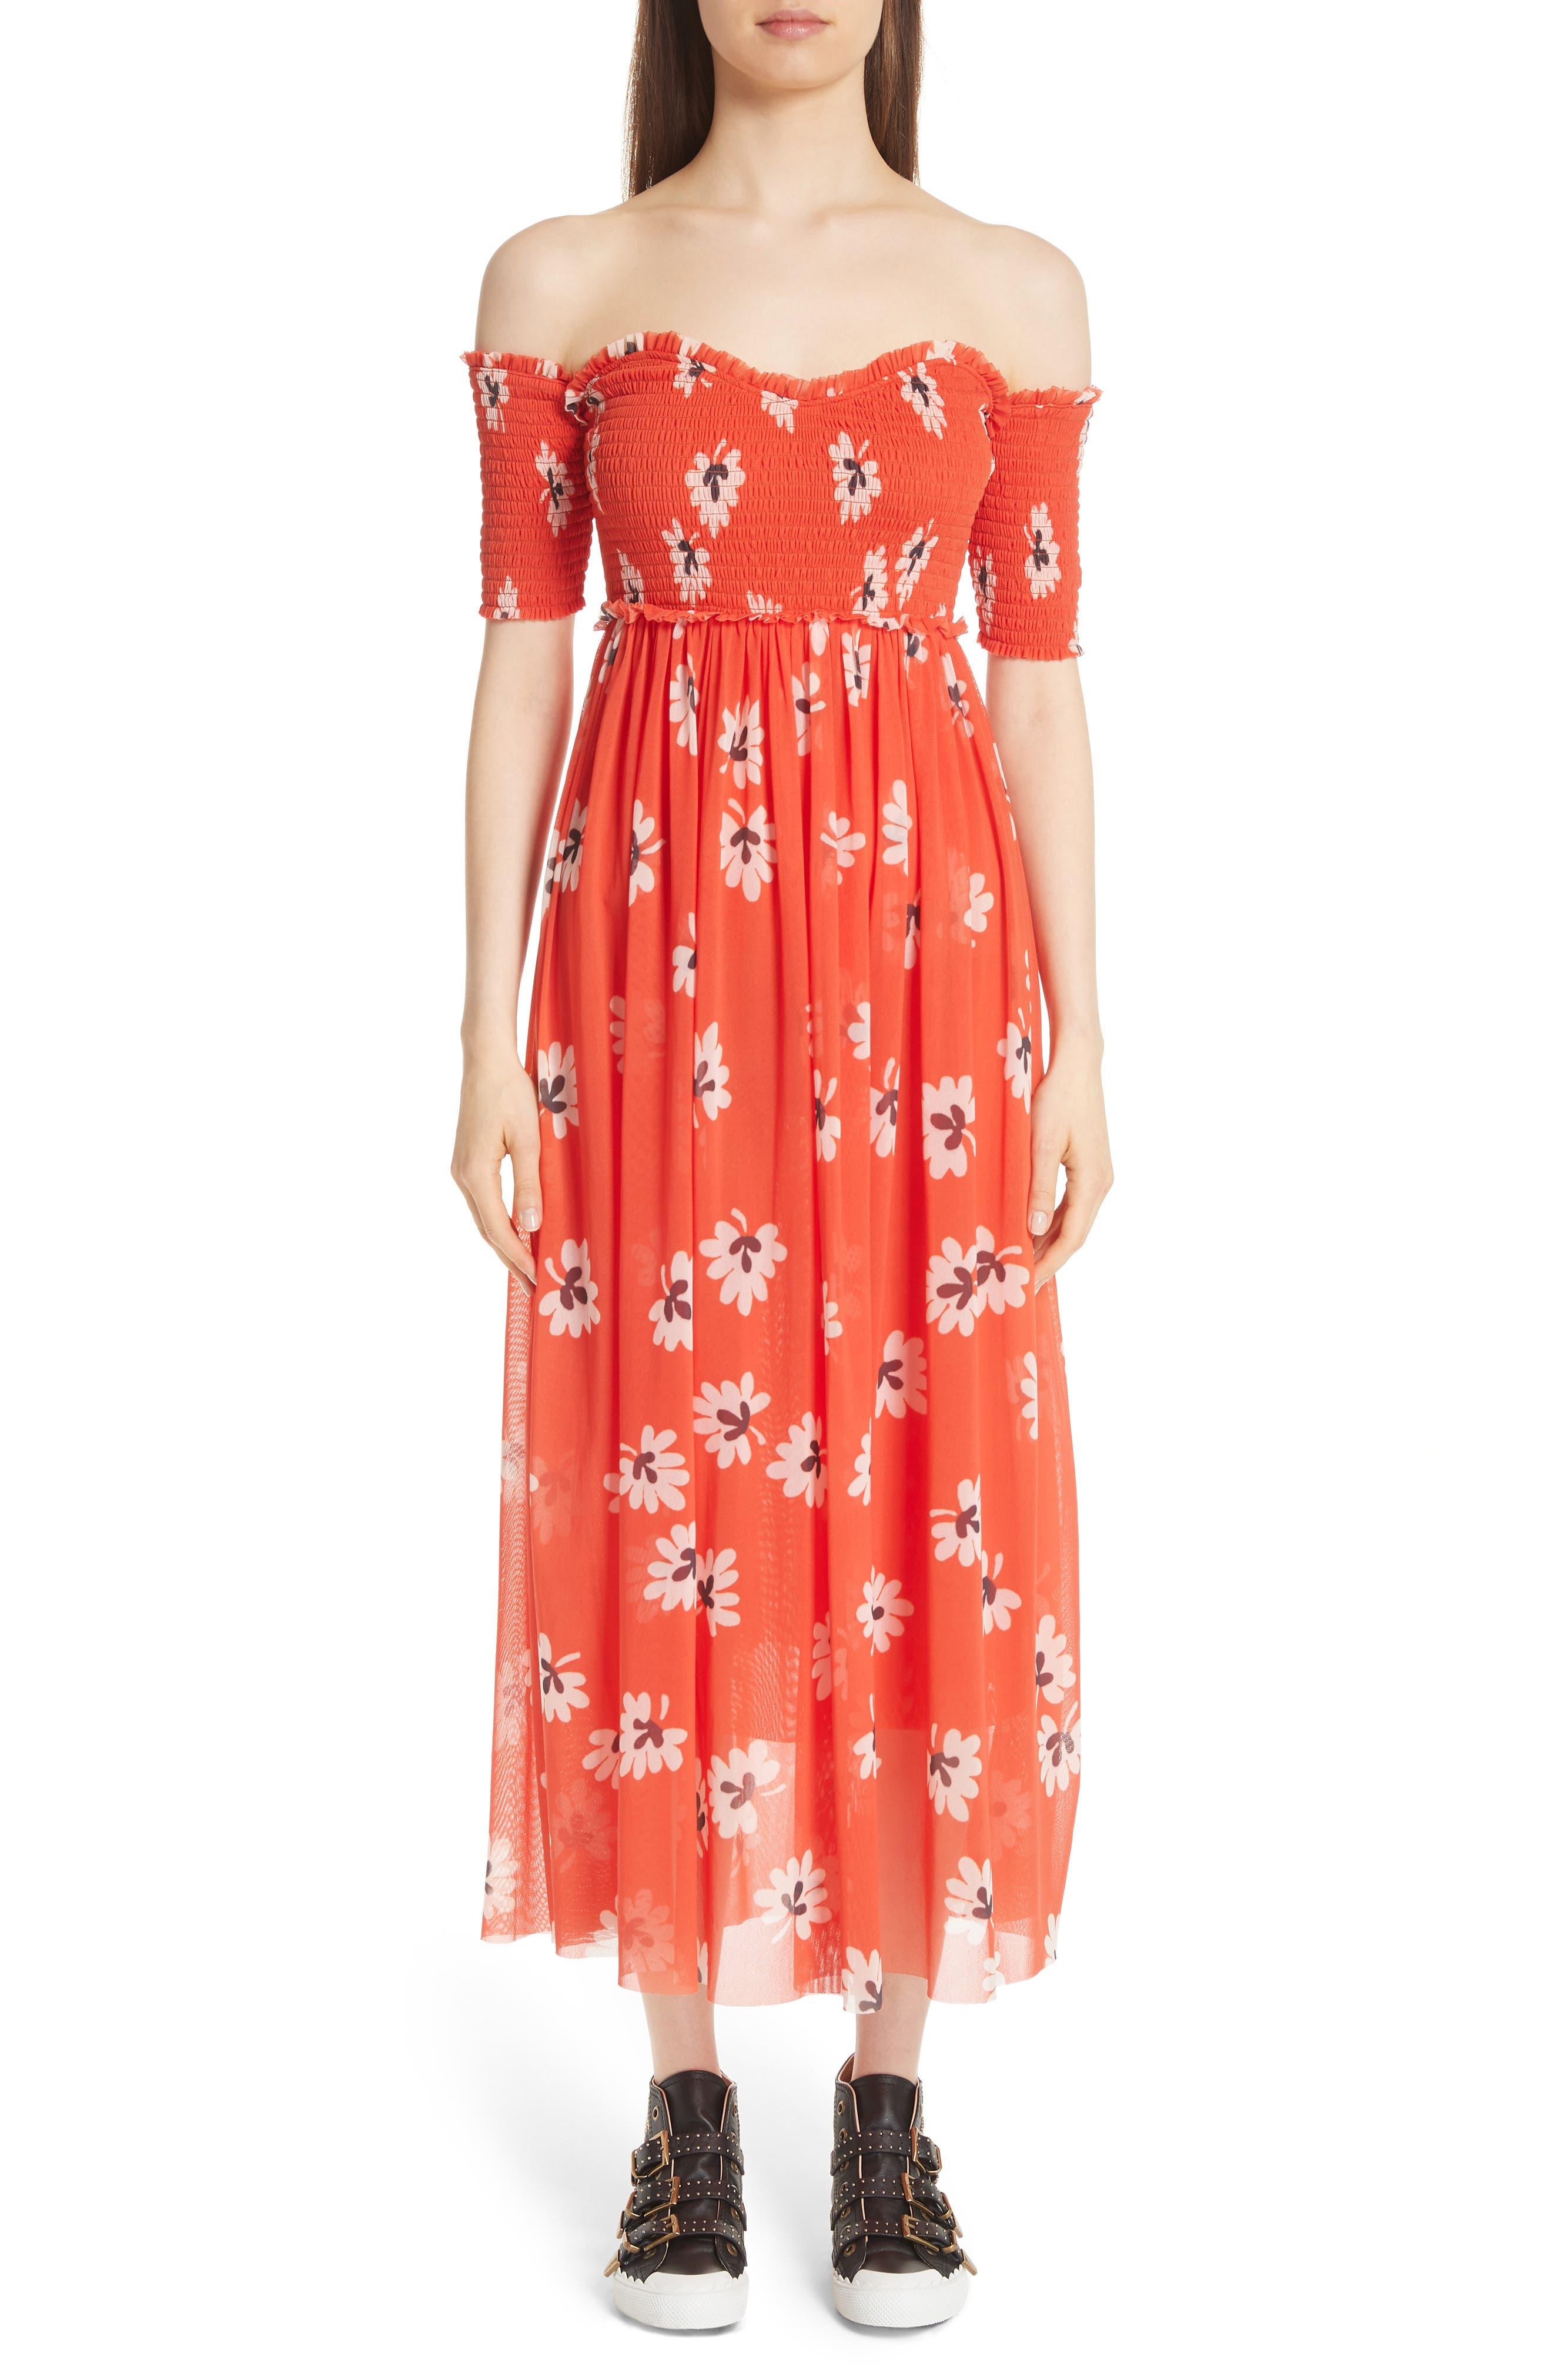 Tilden Mesh Dress,                             Main thumbnail 1, color,                             600